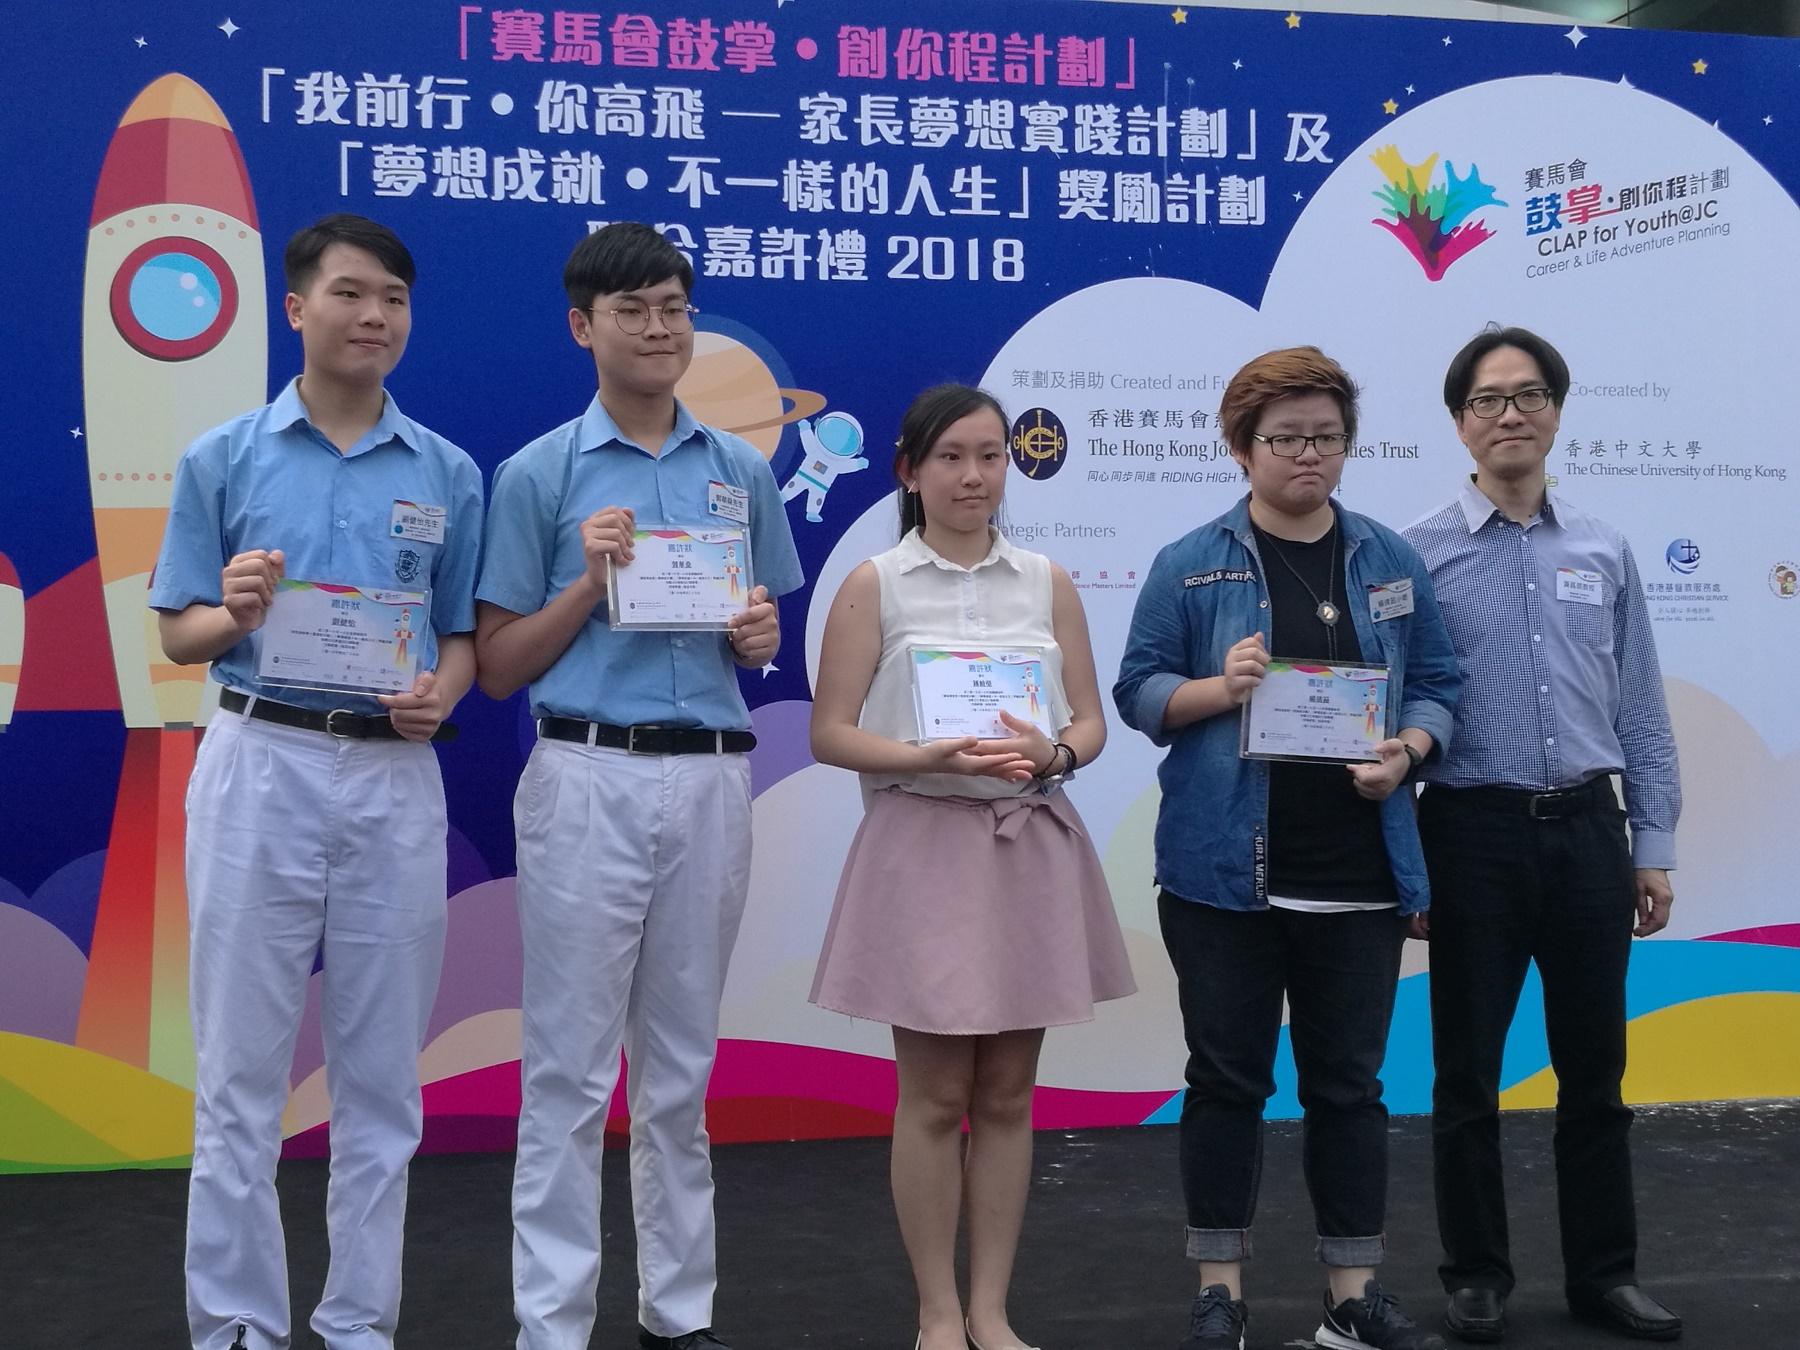 http://npc.edu.hk/sites/default/files/img_20180429_164039.jpg